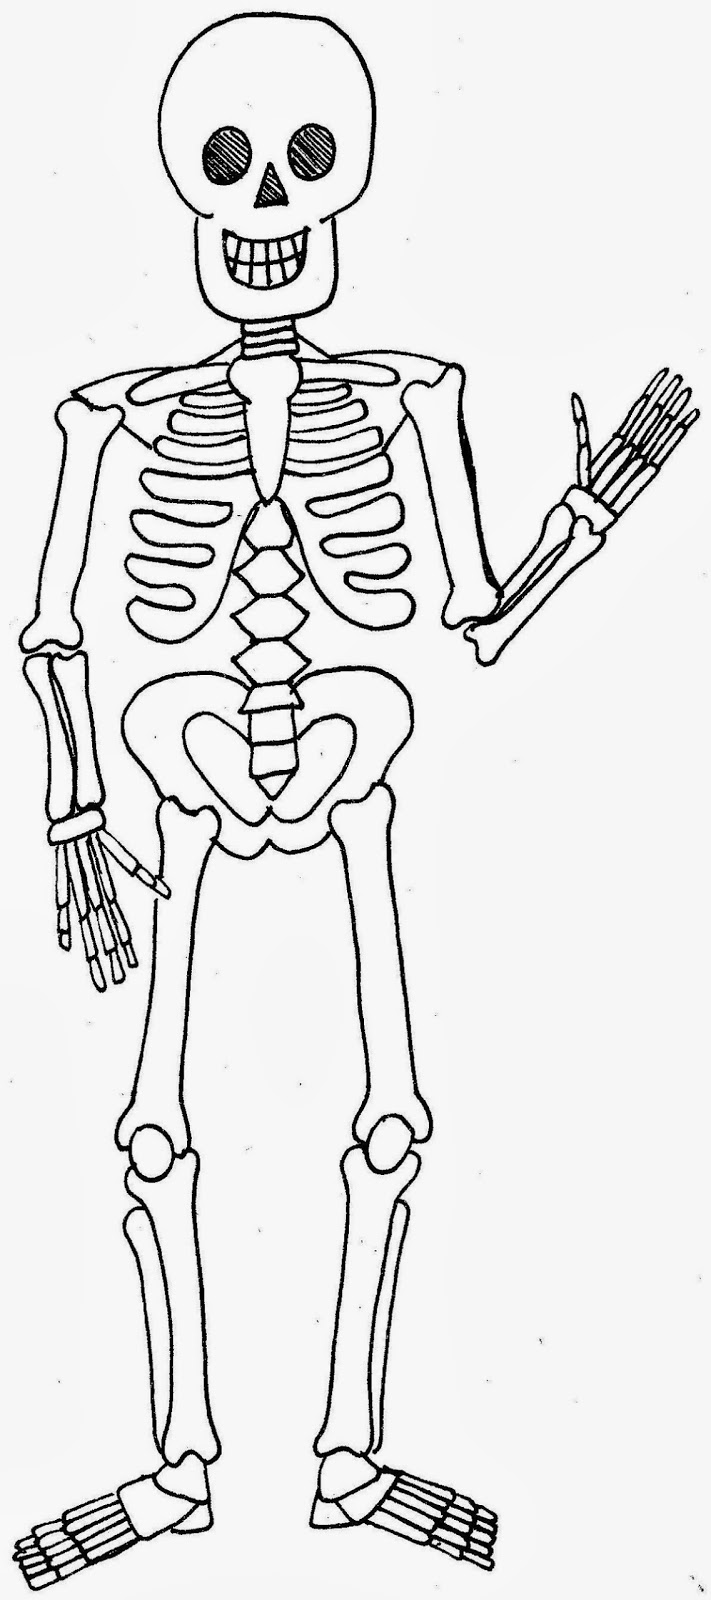 medium resolution of human body skeleton diagram rachael edwards dog skeleton diagram blank dog anatomy skeleton